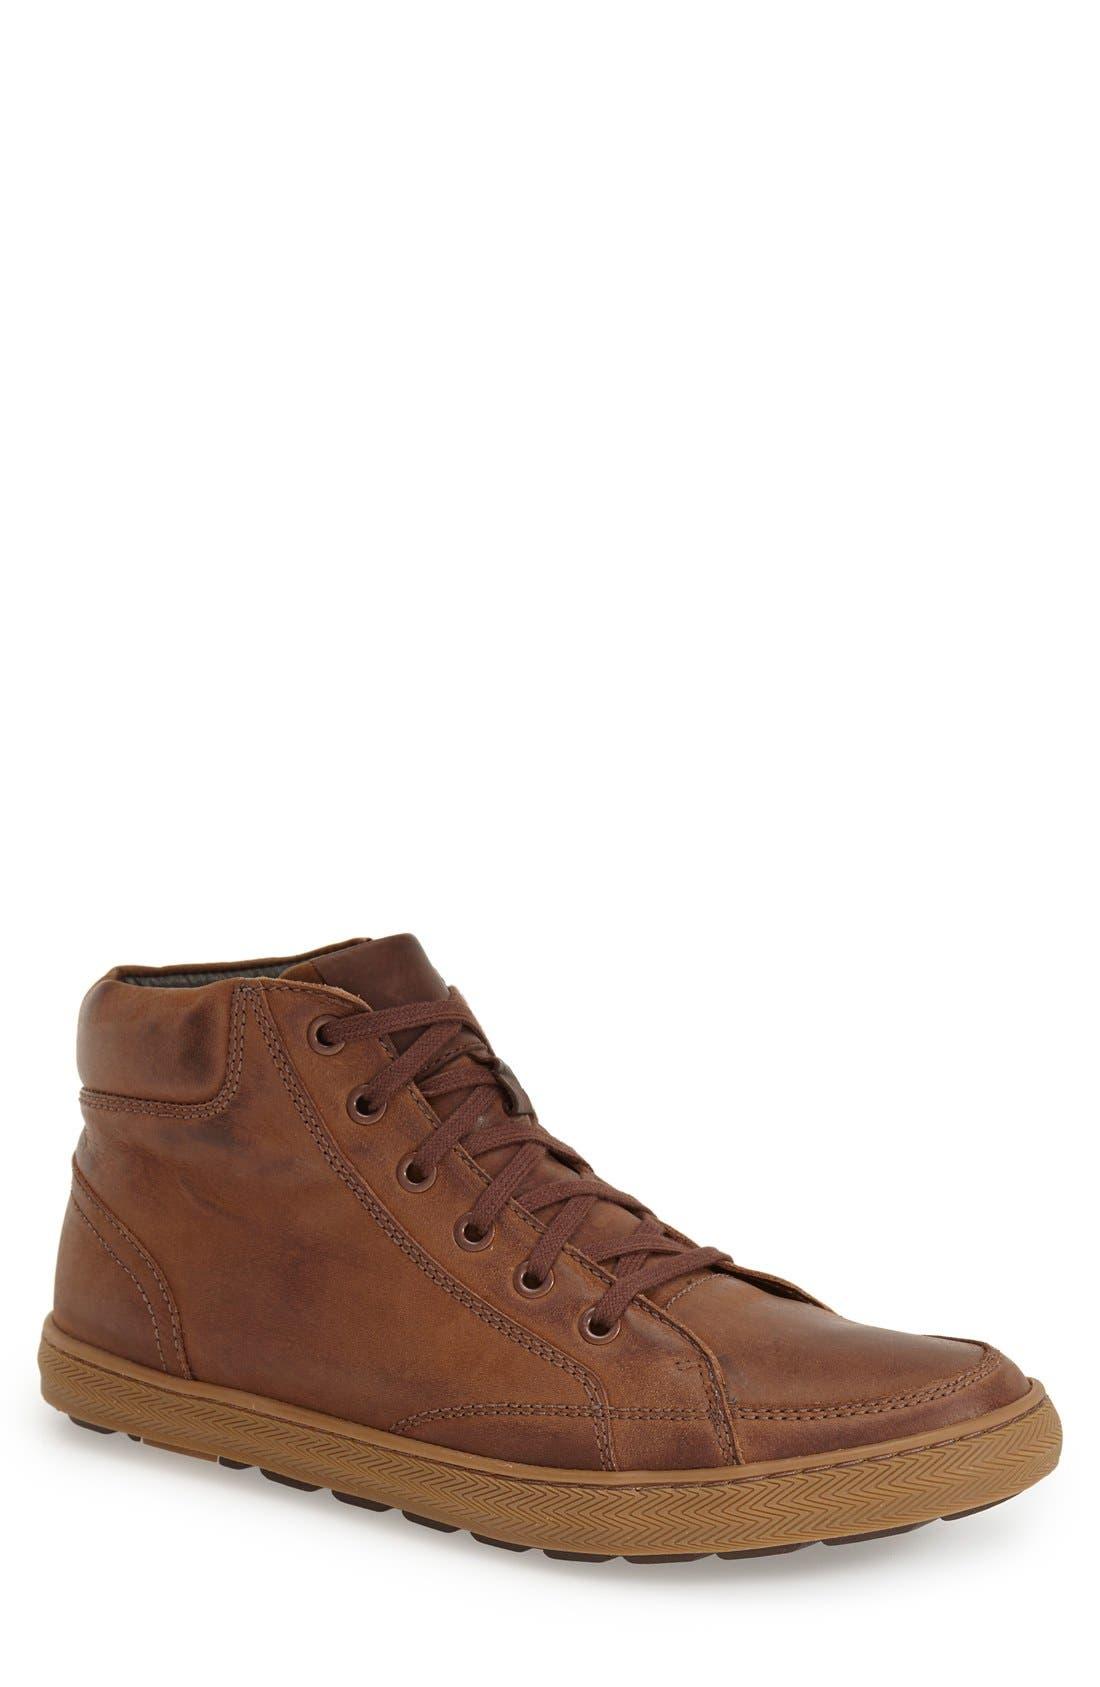 Santos Sneaker,                             Main thumbnail 1, color,                             Brown